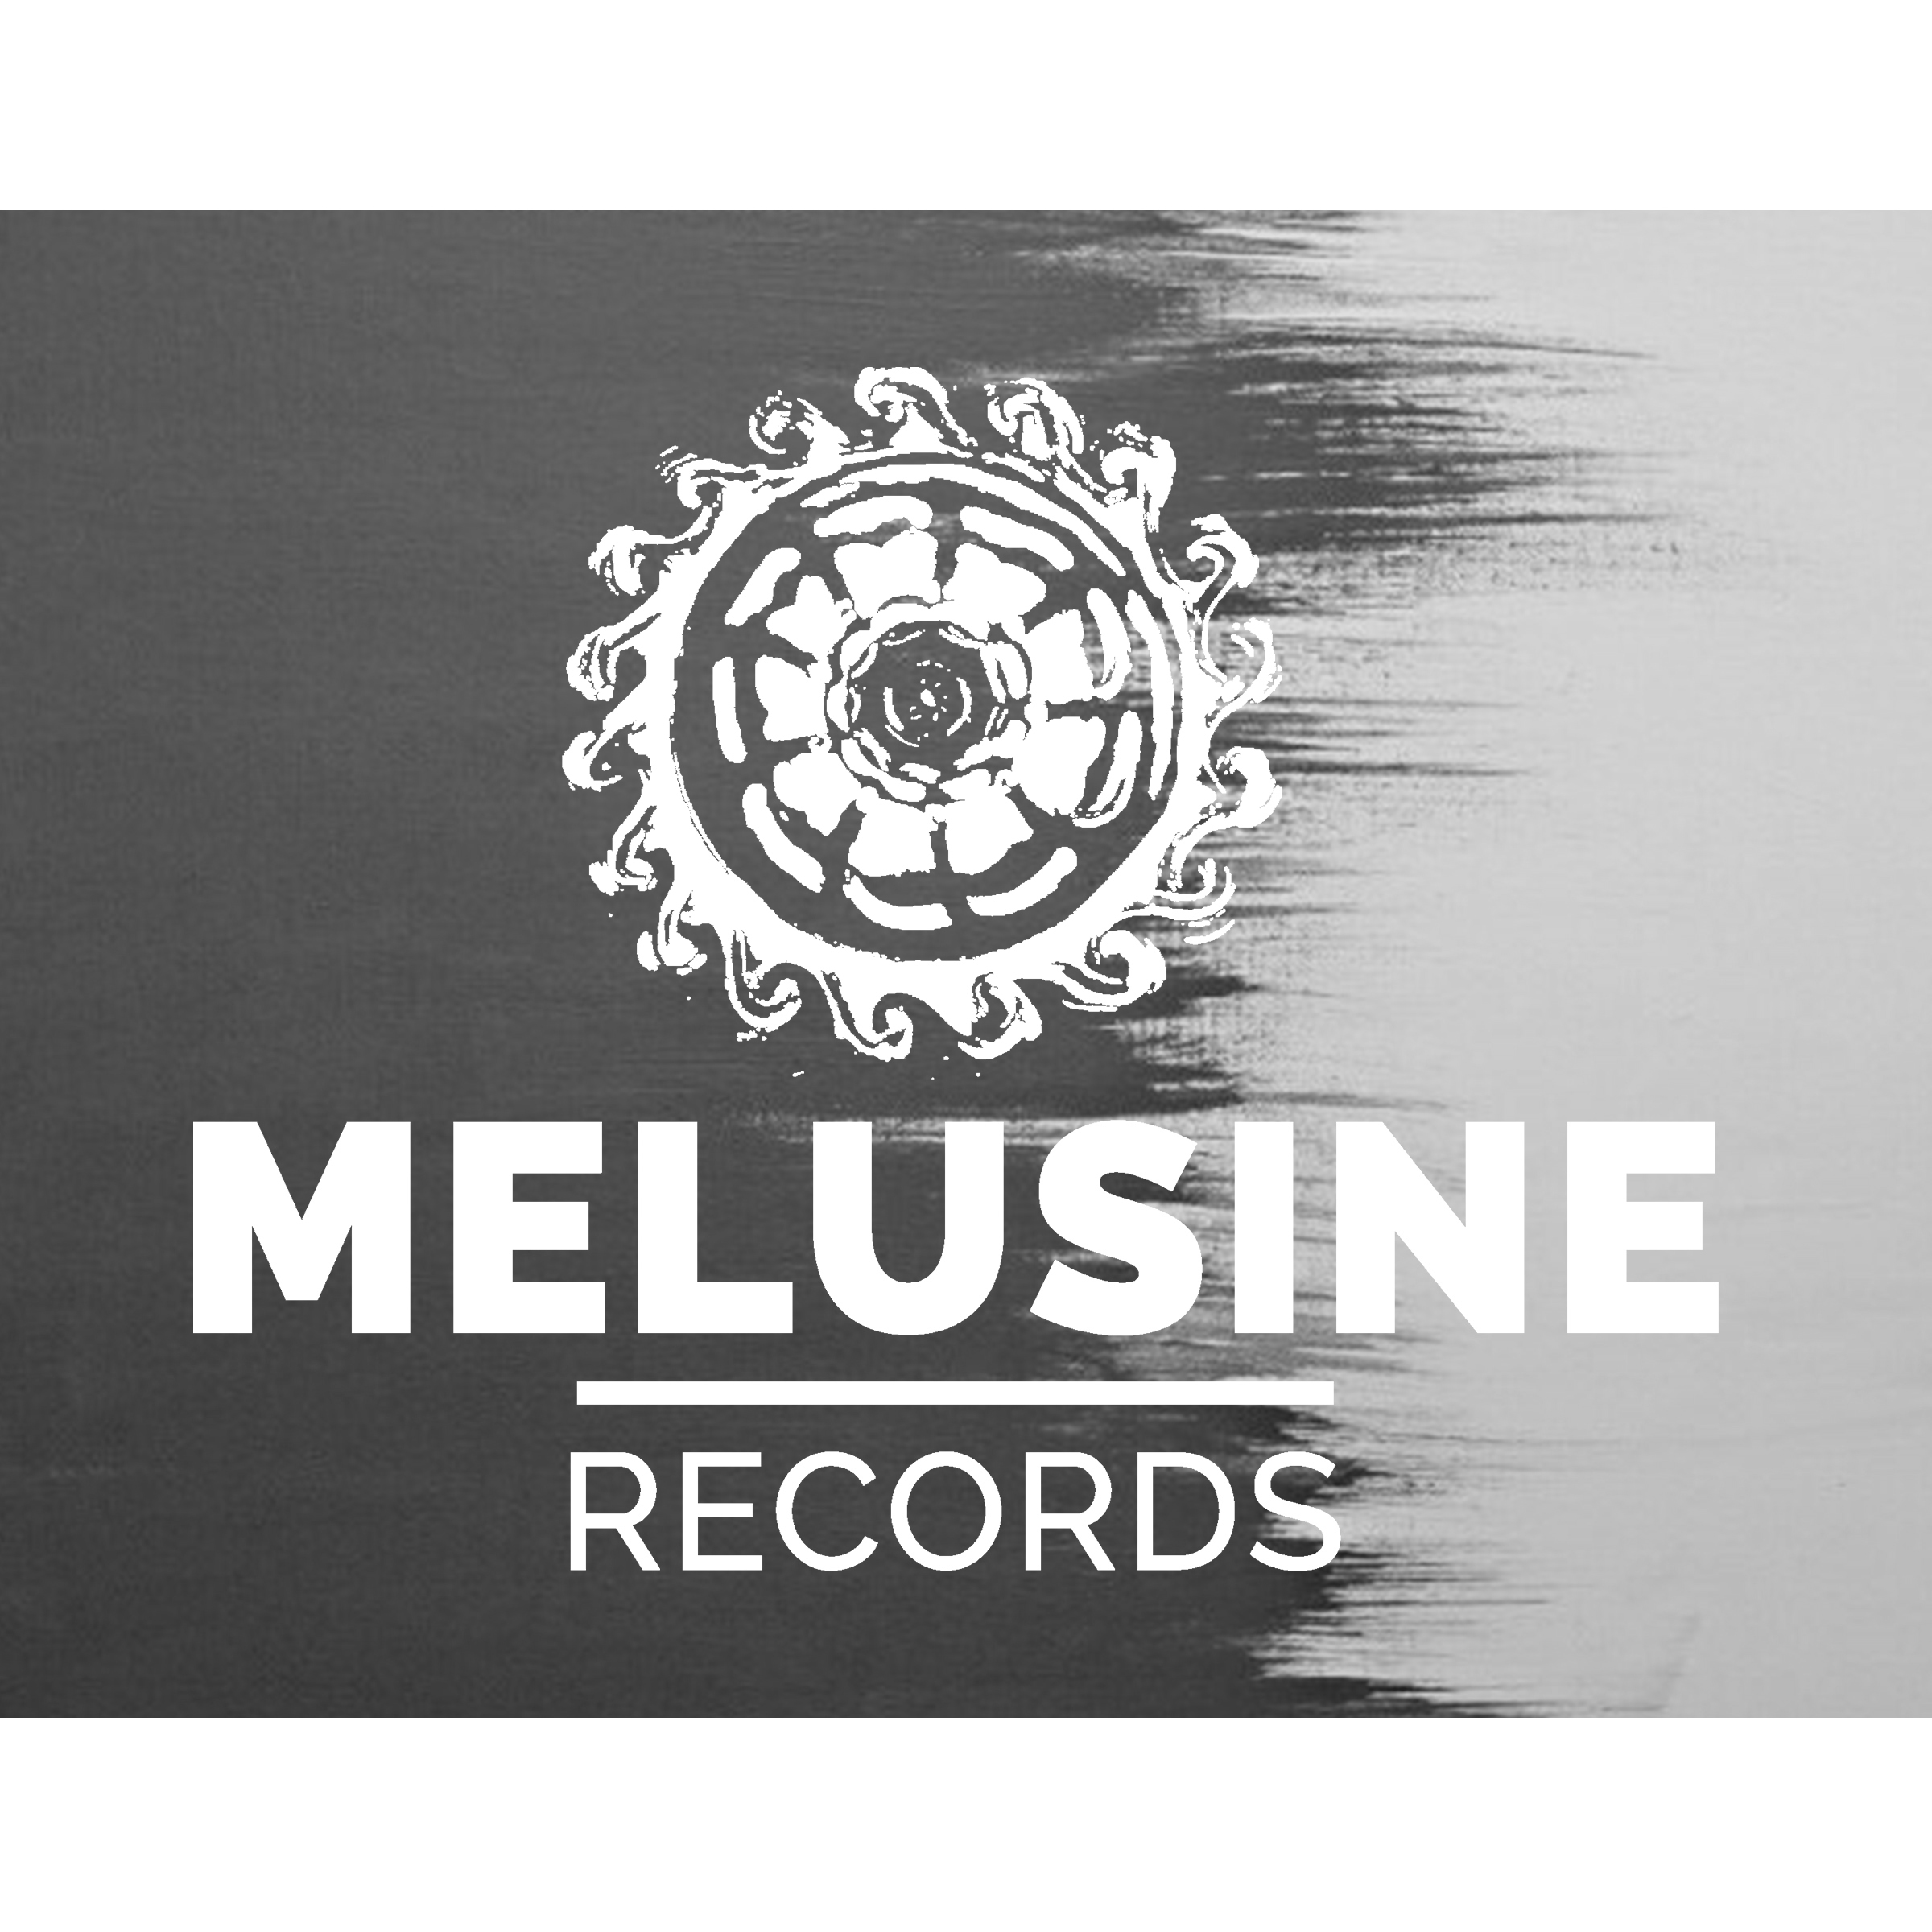 melusine_records_black_and_white